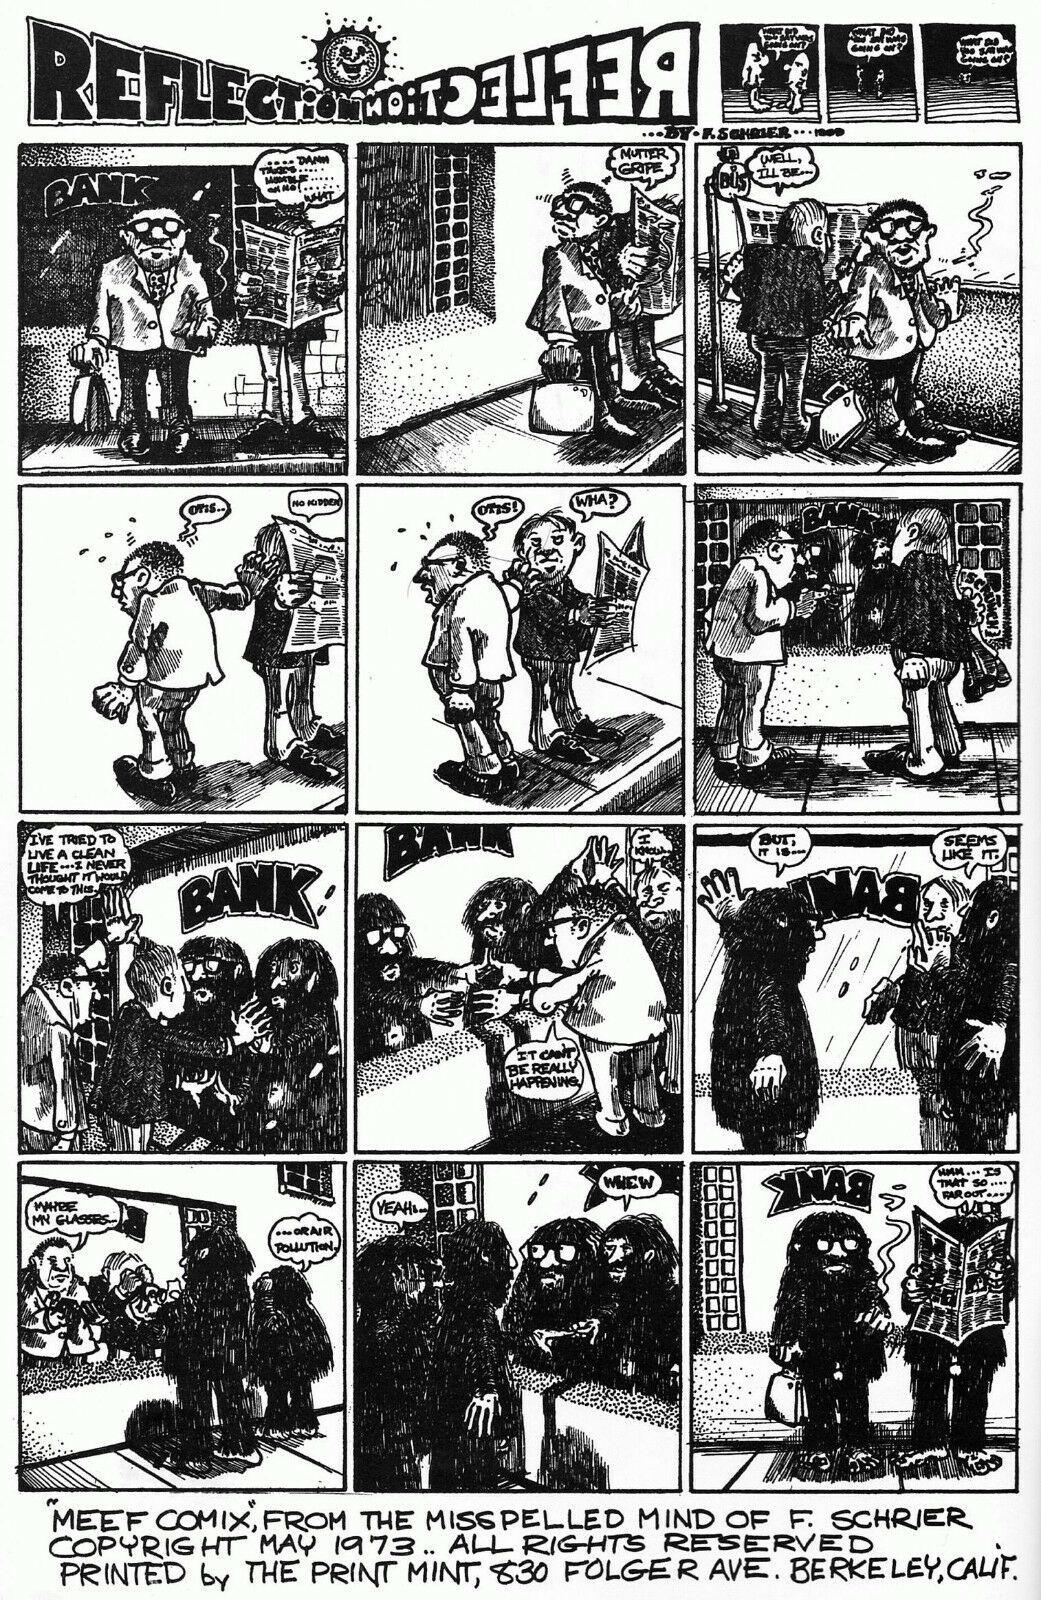 MEEF 2, Dave Sheridan, Fred Schrier, Print Mint 1973 Classic Underground Comix -